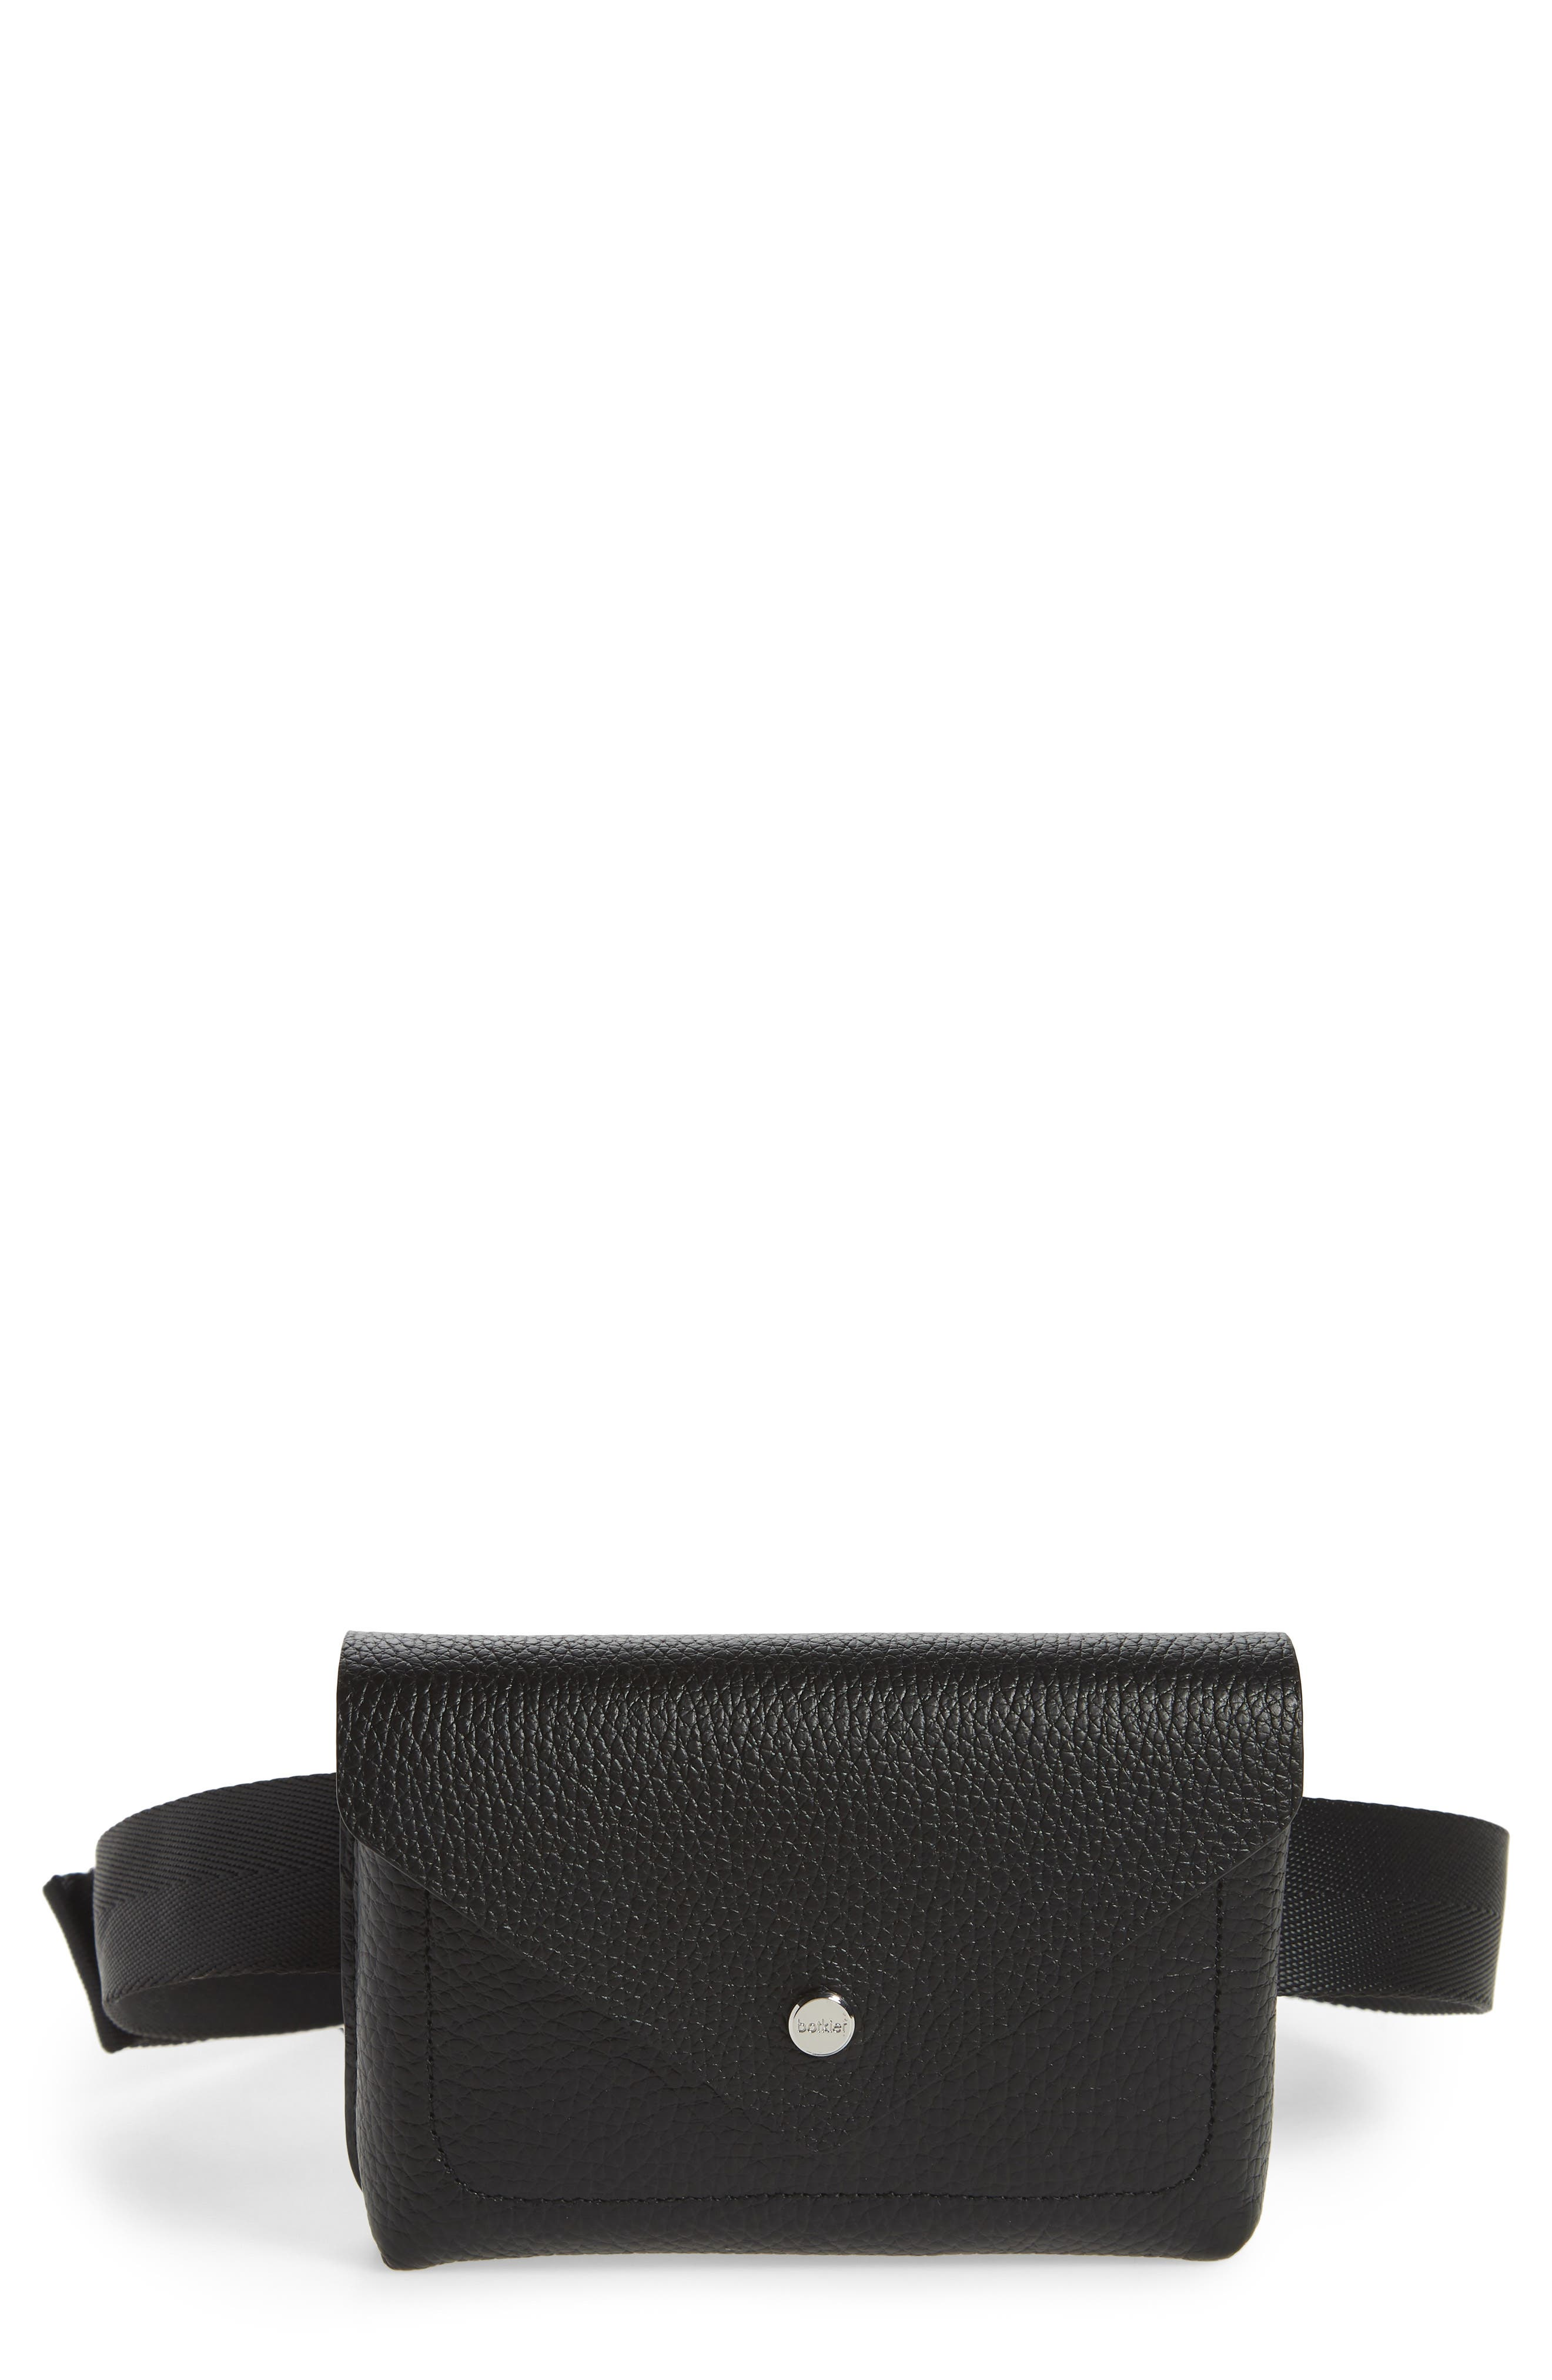 Vivi Calfskin Leather Convertible Belt Bag,                             Main thumbnail 1, color,                             BLACK